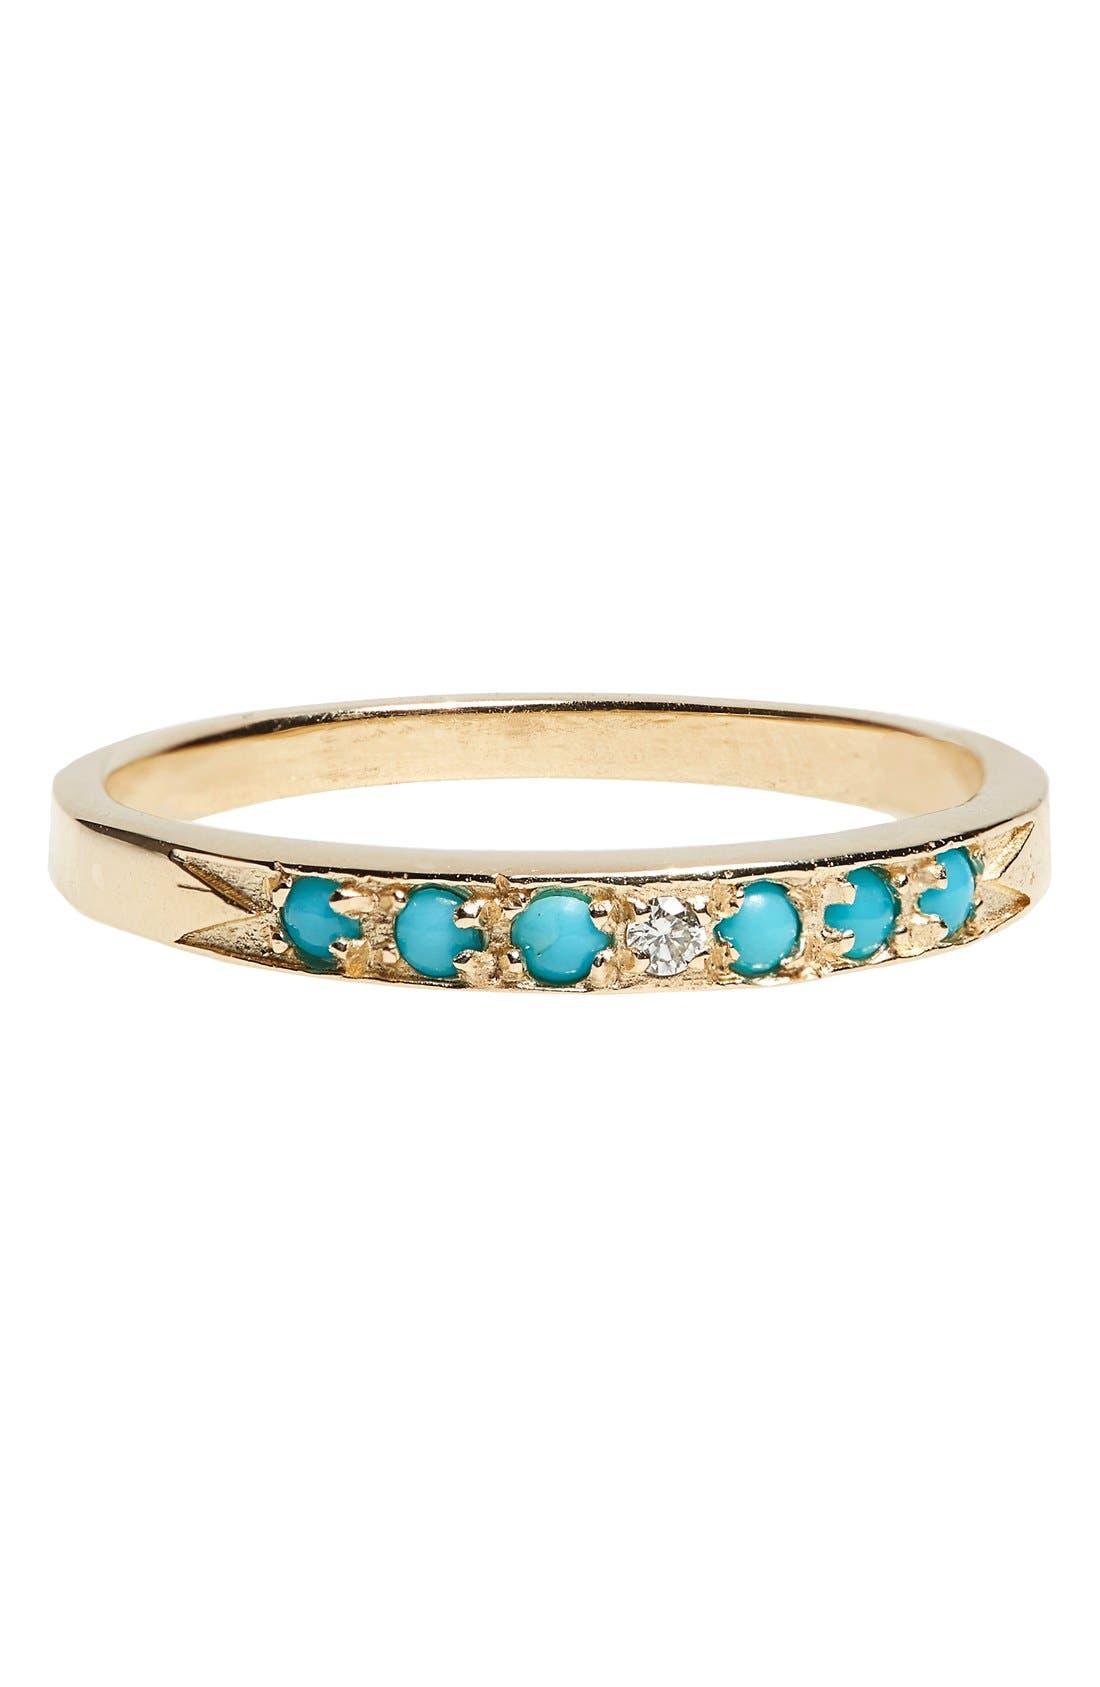 'Moon & Stars' Single Band Turquoise & Diamond Ring,                             Main thumbnail 1, color,                             710